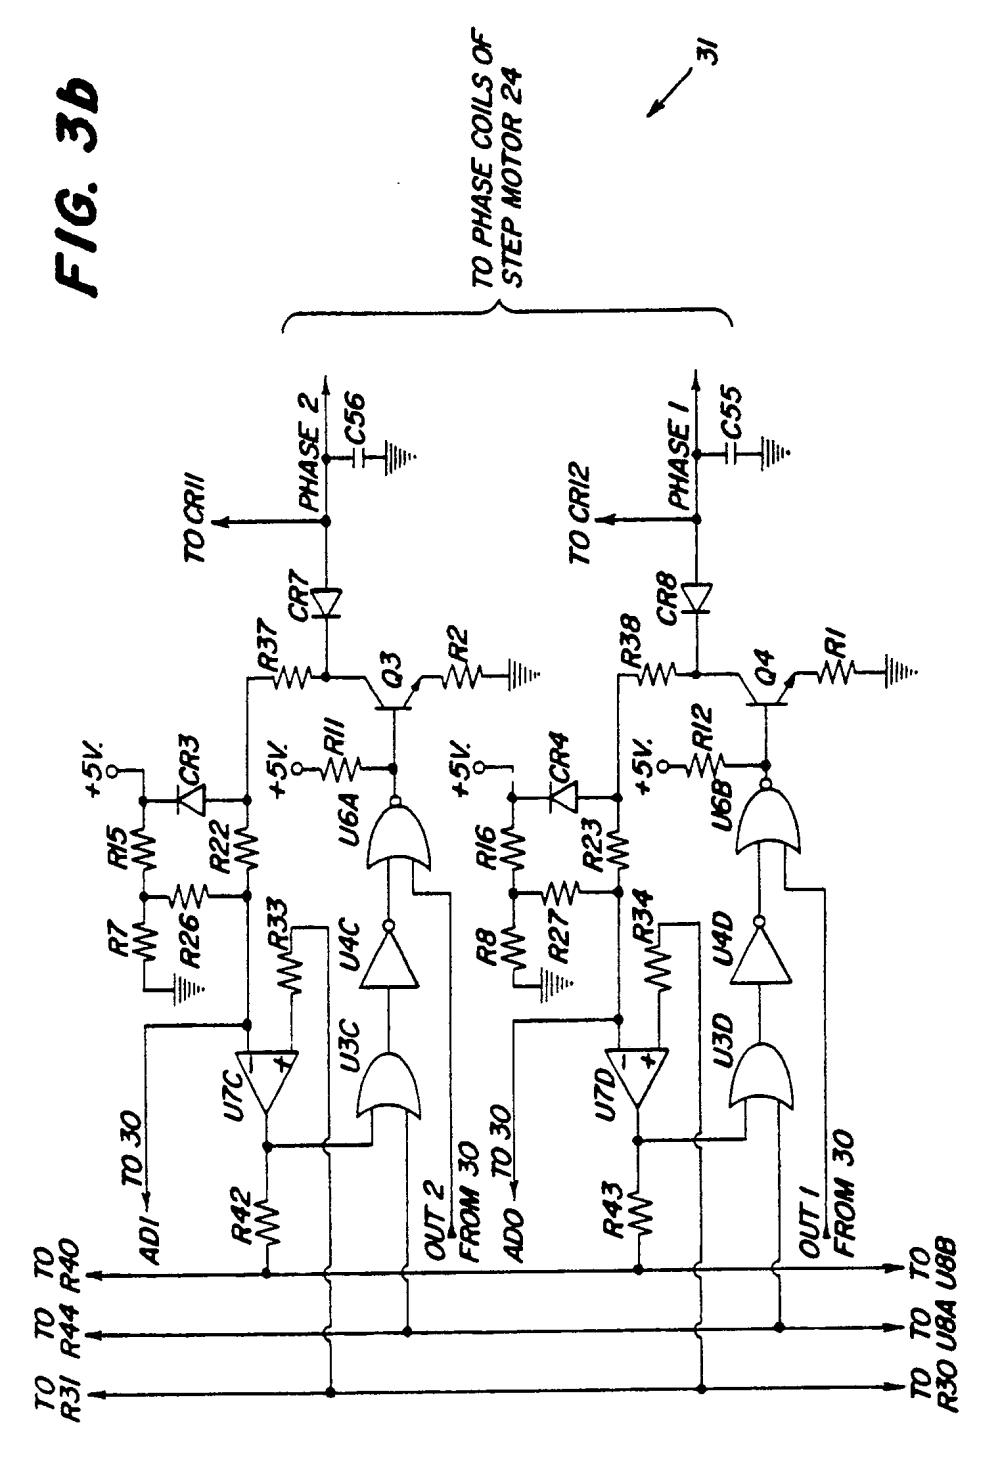 medium resolution of john deere 720 wiring diagram john free engine image for john deere tractor wiring diagrams john deere gator wiring diagram